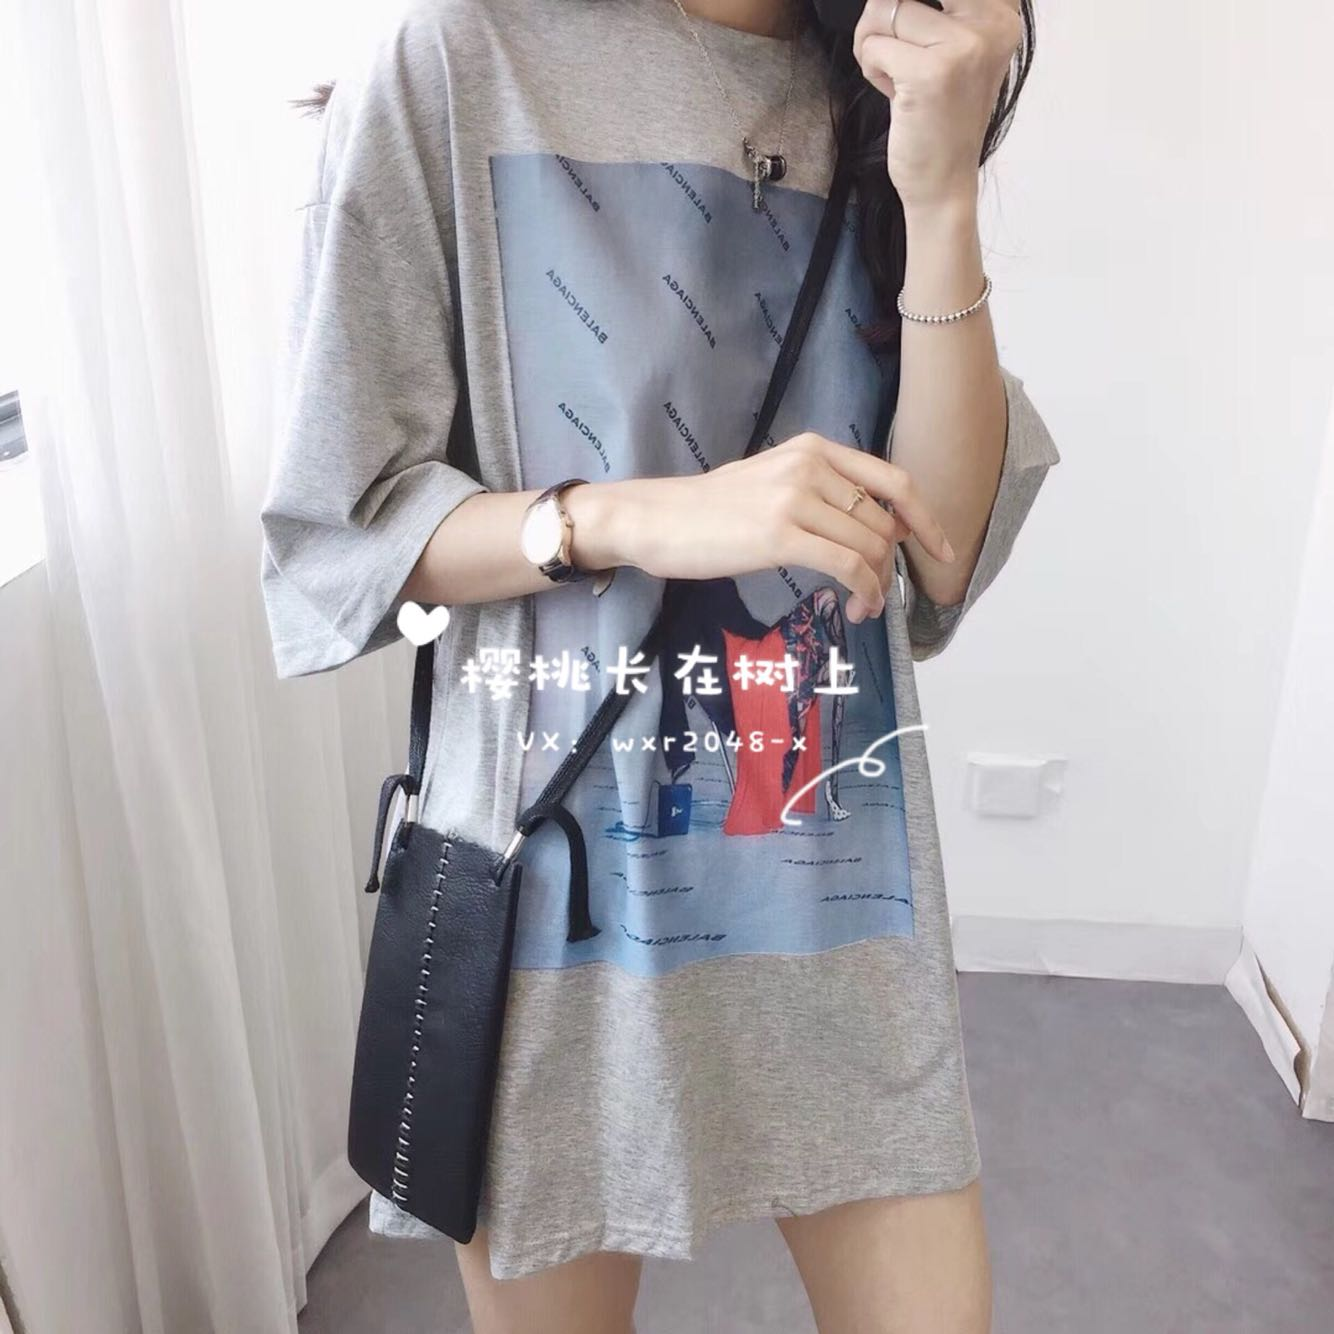 B家贴布长款下衣失踪T恤t-shirt短袖女韩版宽松原创设计新品热销